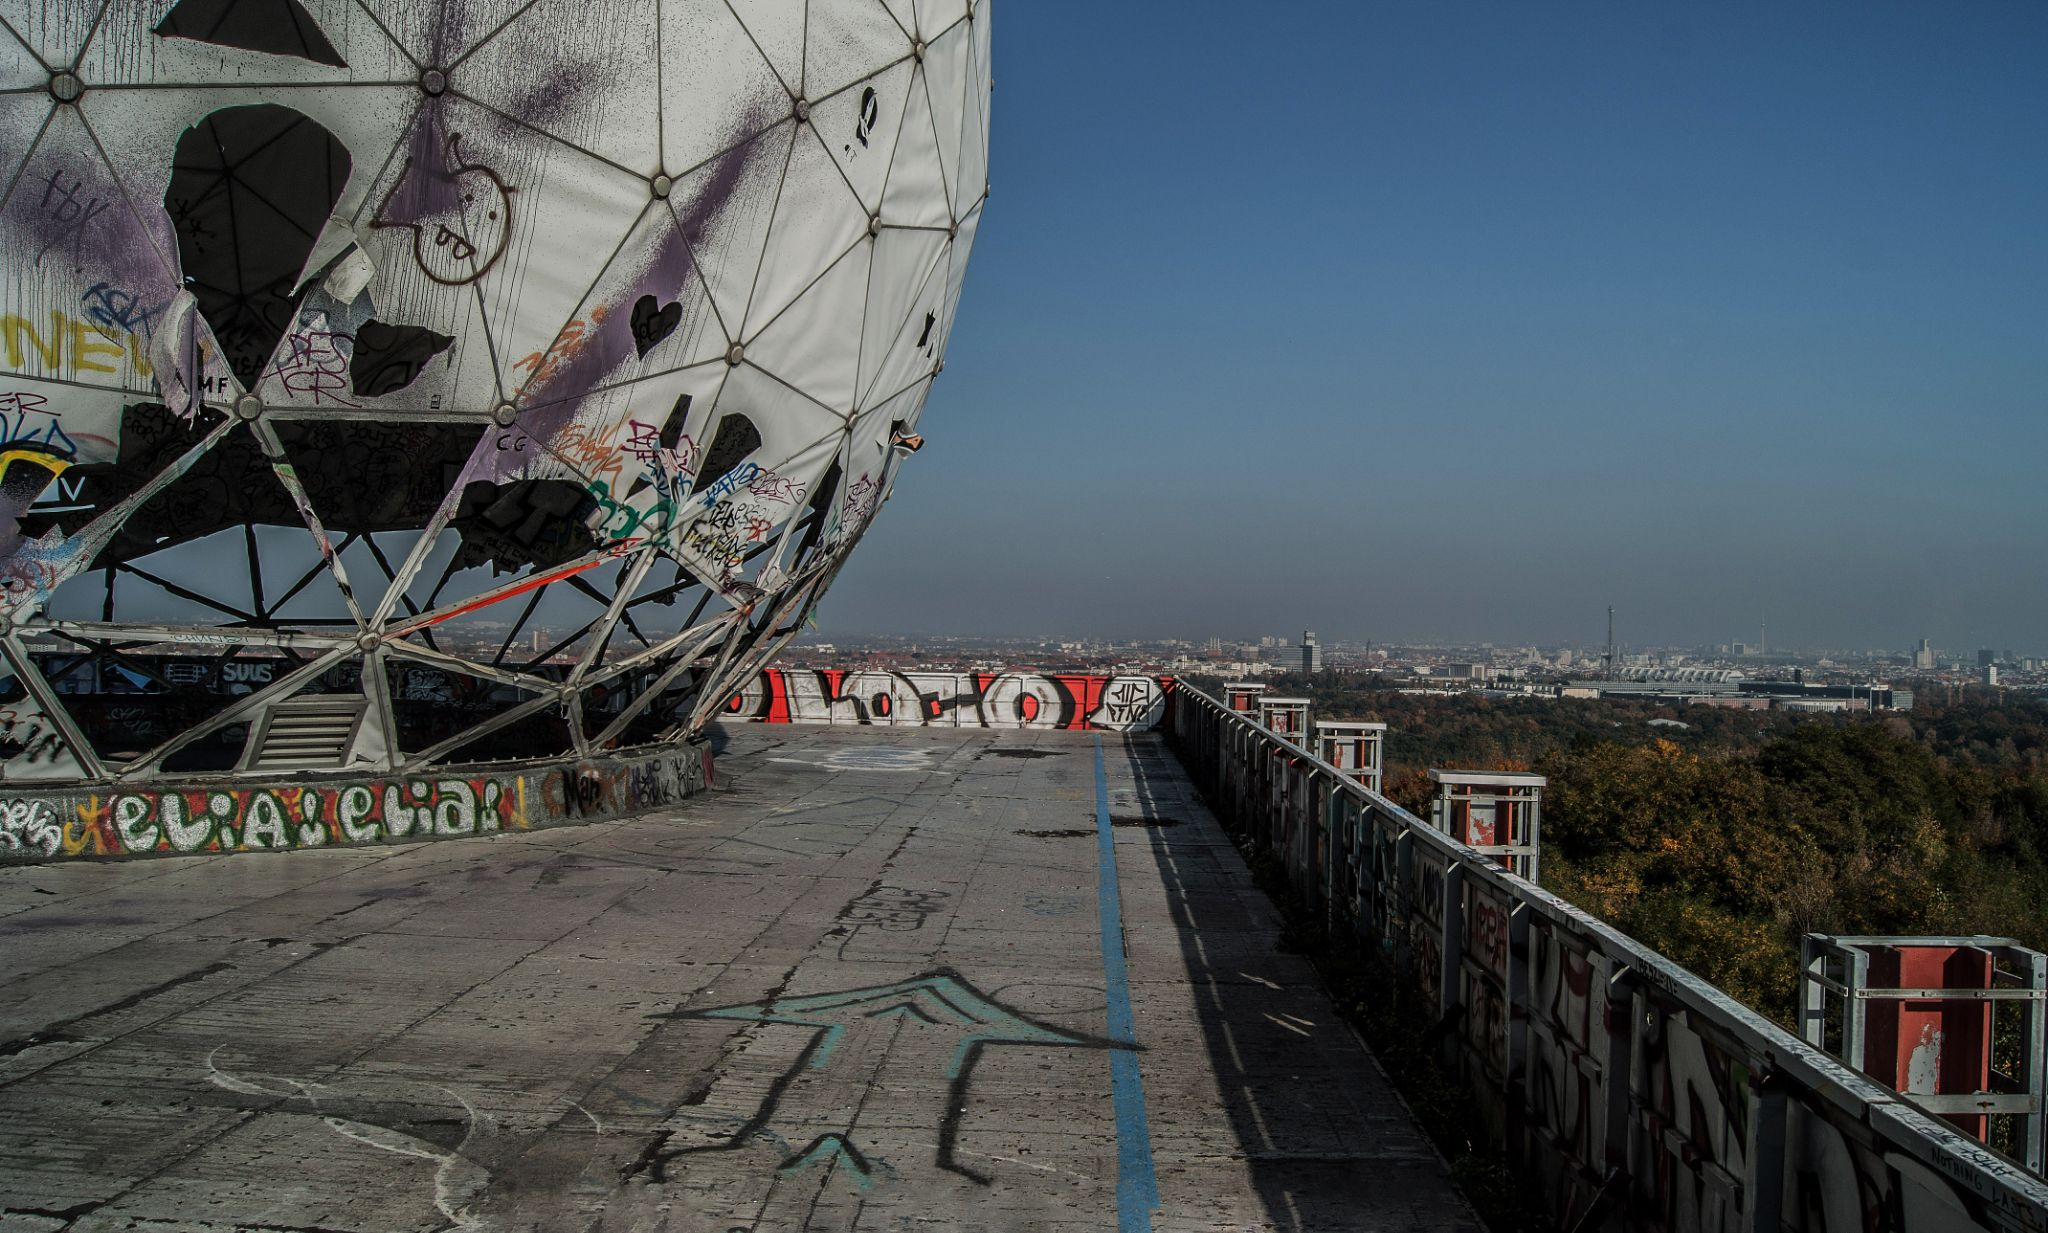 Angel of Berlin by tim.schlaab